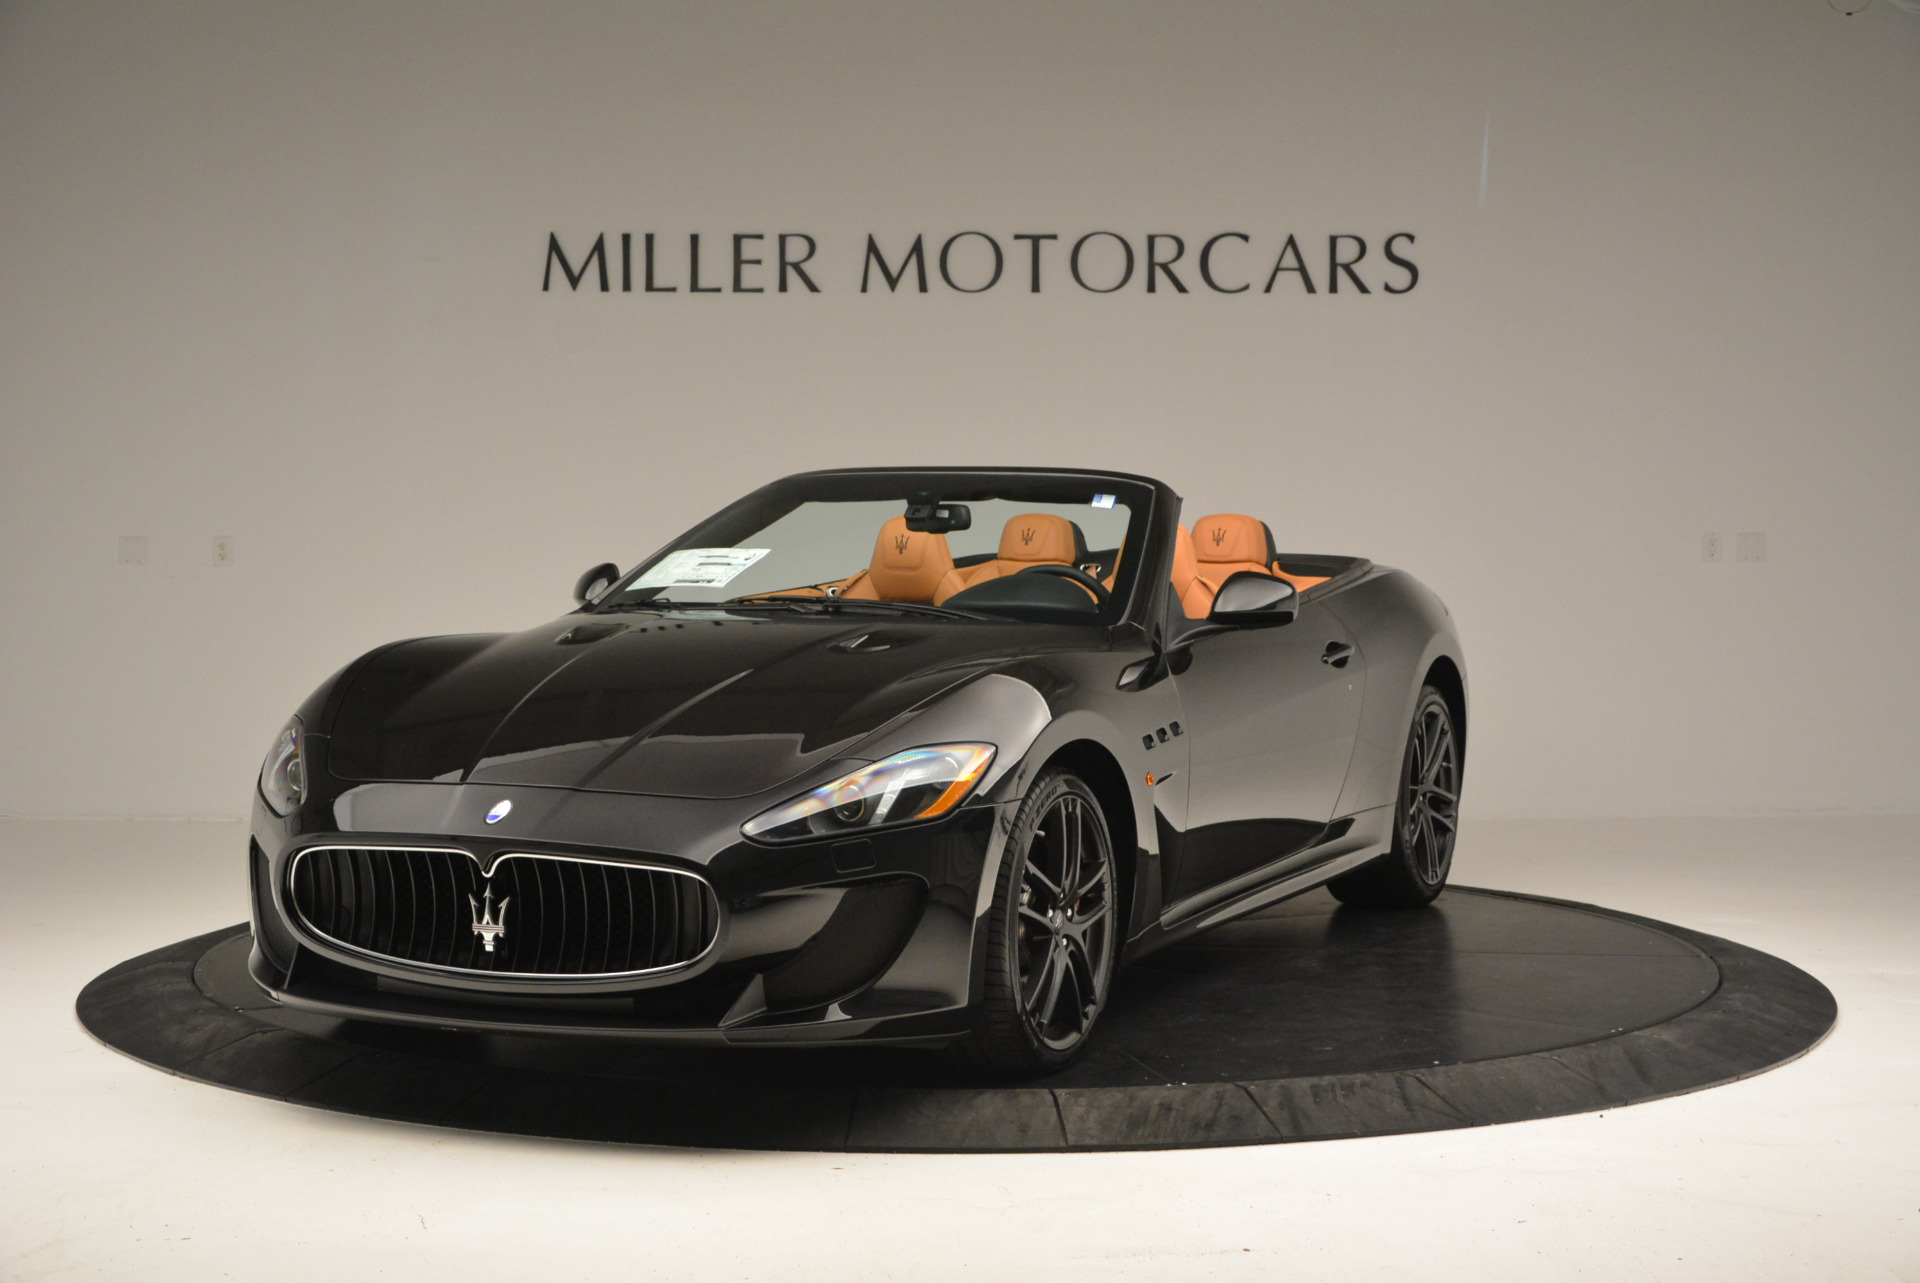 New 2017 Maserati GranTurismo MC for sale Sold at Rolls-Royce Motor Cars Greenwich in Greenwich CT 06830 1